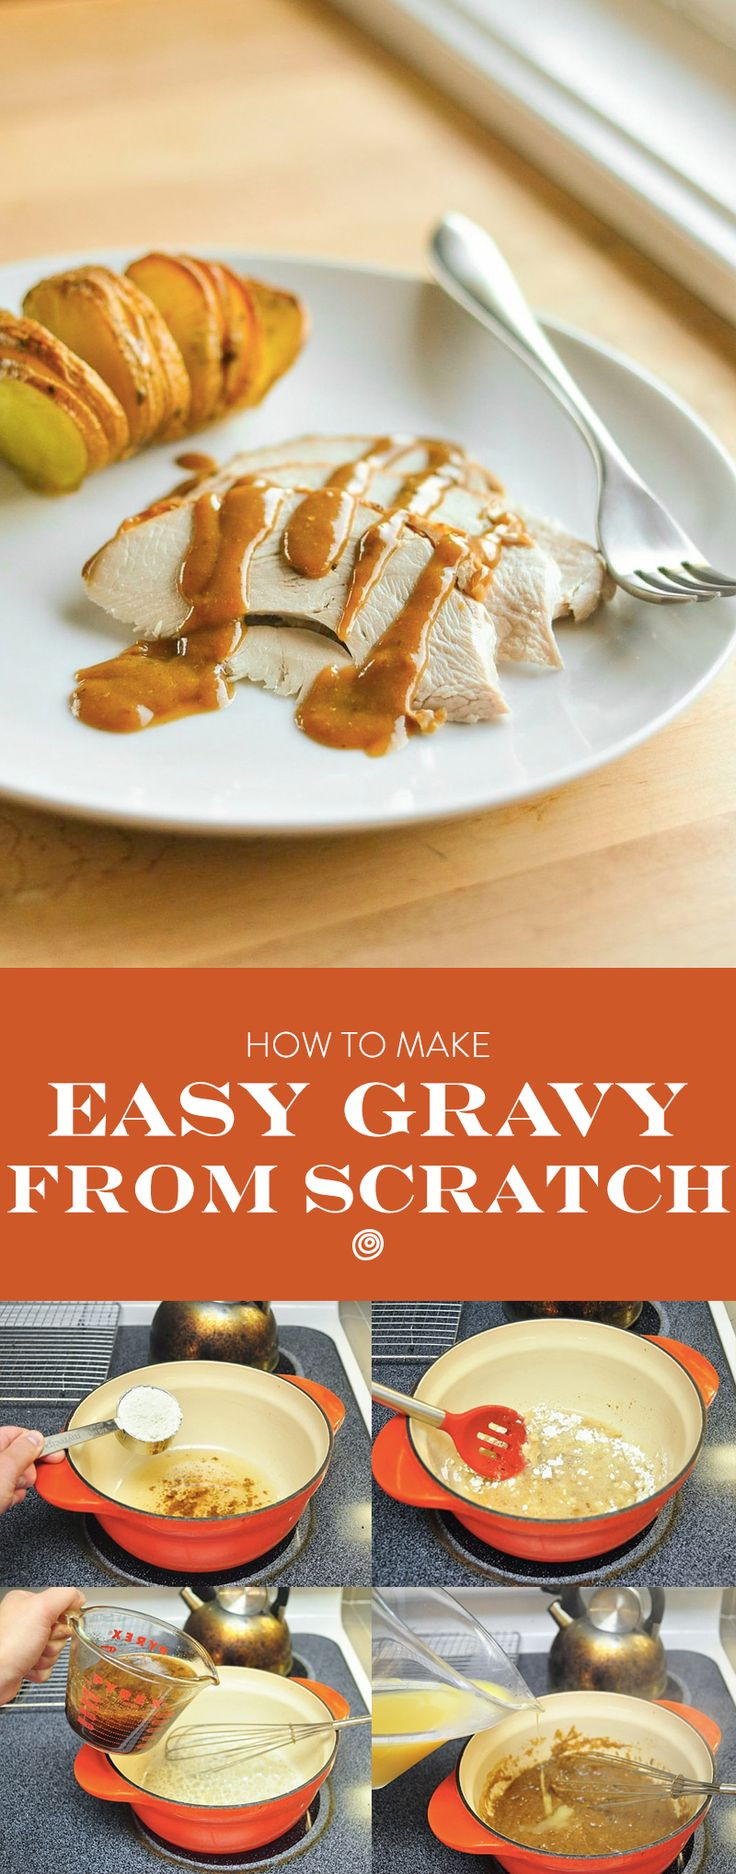 Turkey Gravy From Scratch  How To Make an Easy Turkey Gravy Recipe